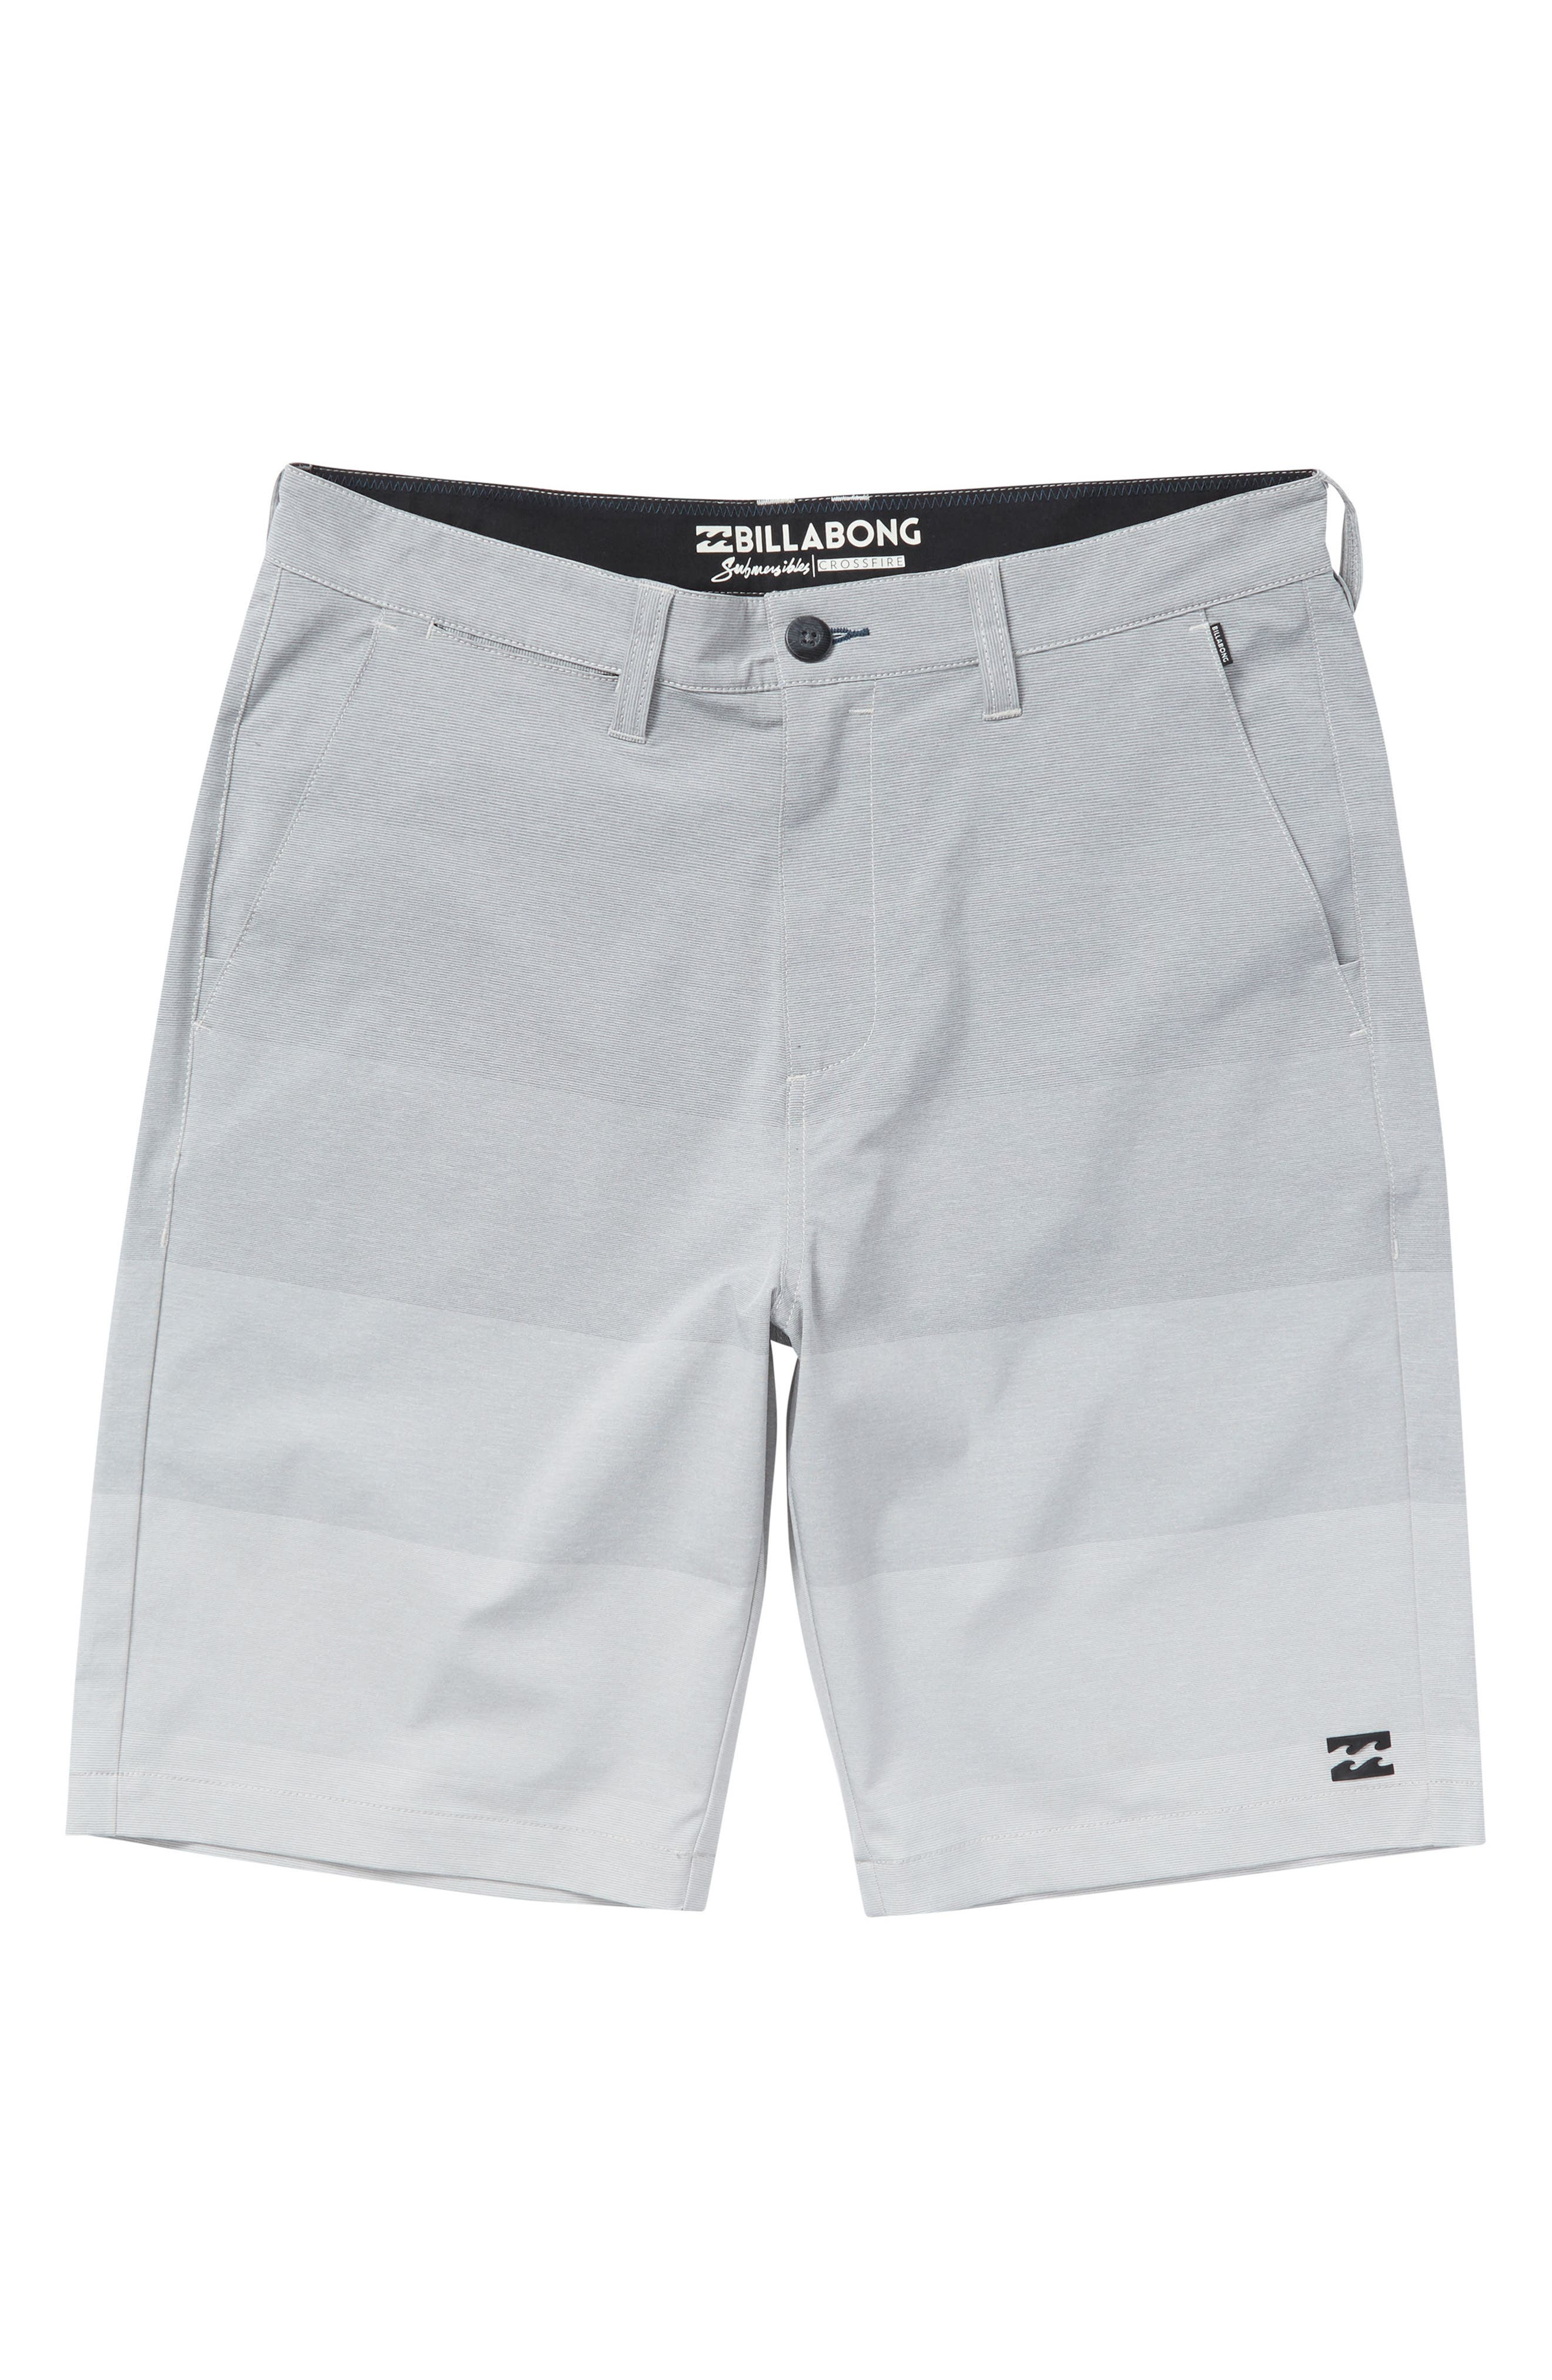 Crossfire X Faderade Hybrid Shorts,                         Main,                         color, 020